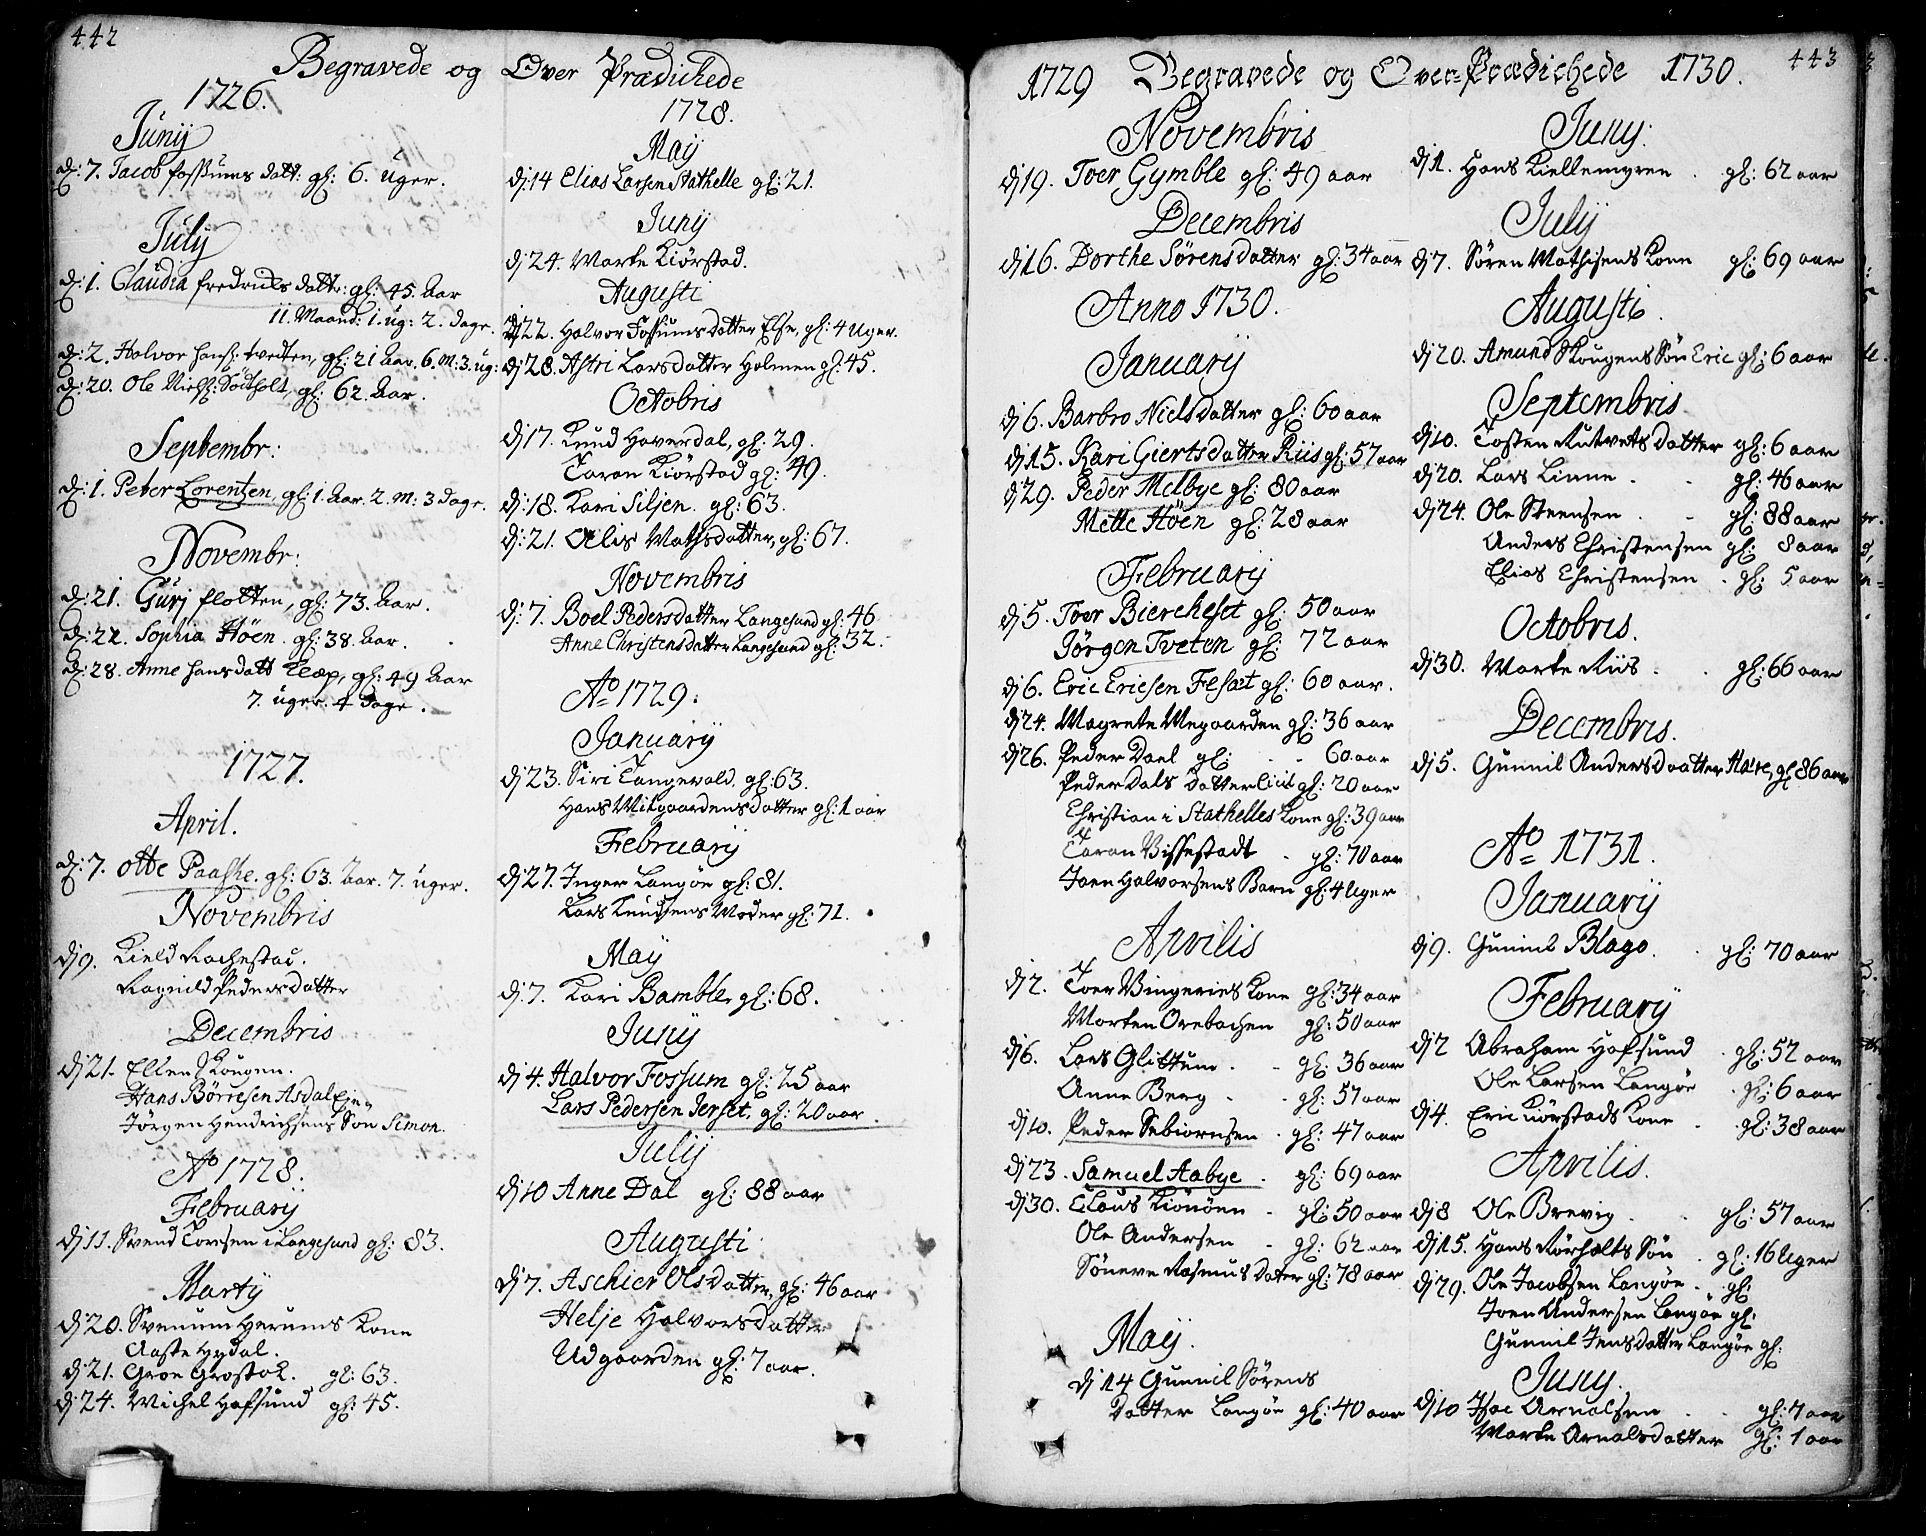 SAKO, Bamble kirkebøker, F/Fa/L0001: Ministerialbok nr. I 1, 1702-1774, s. 442-443